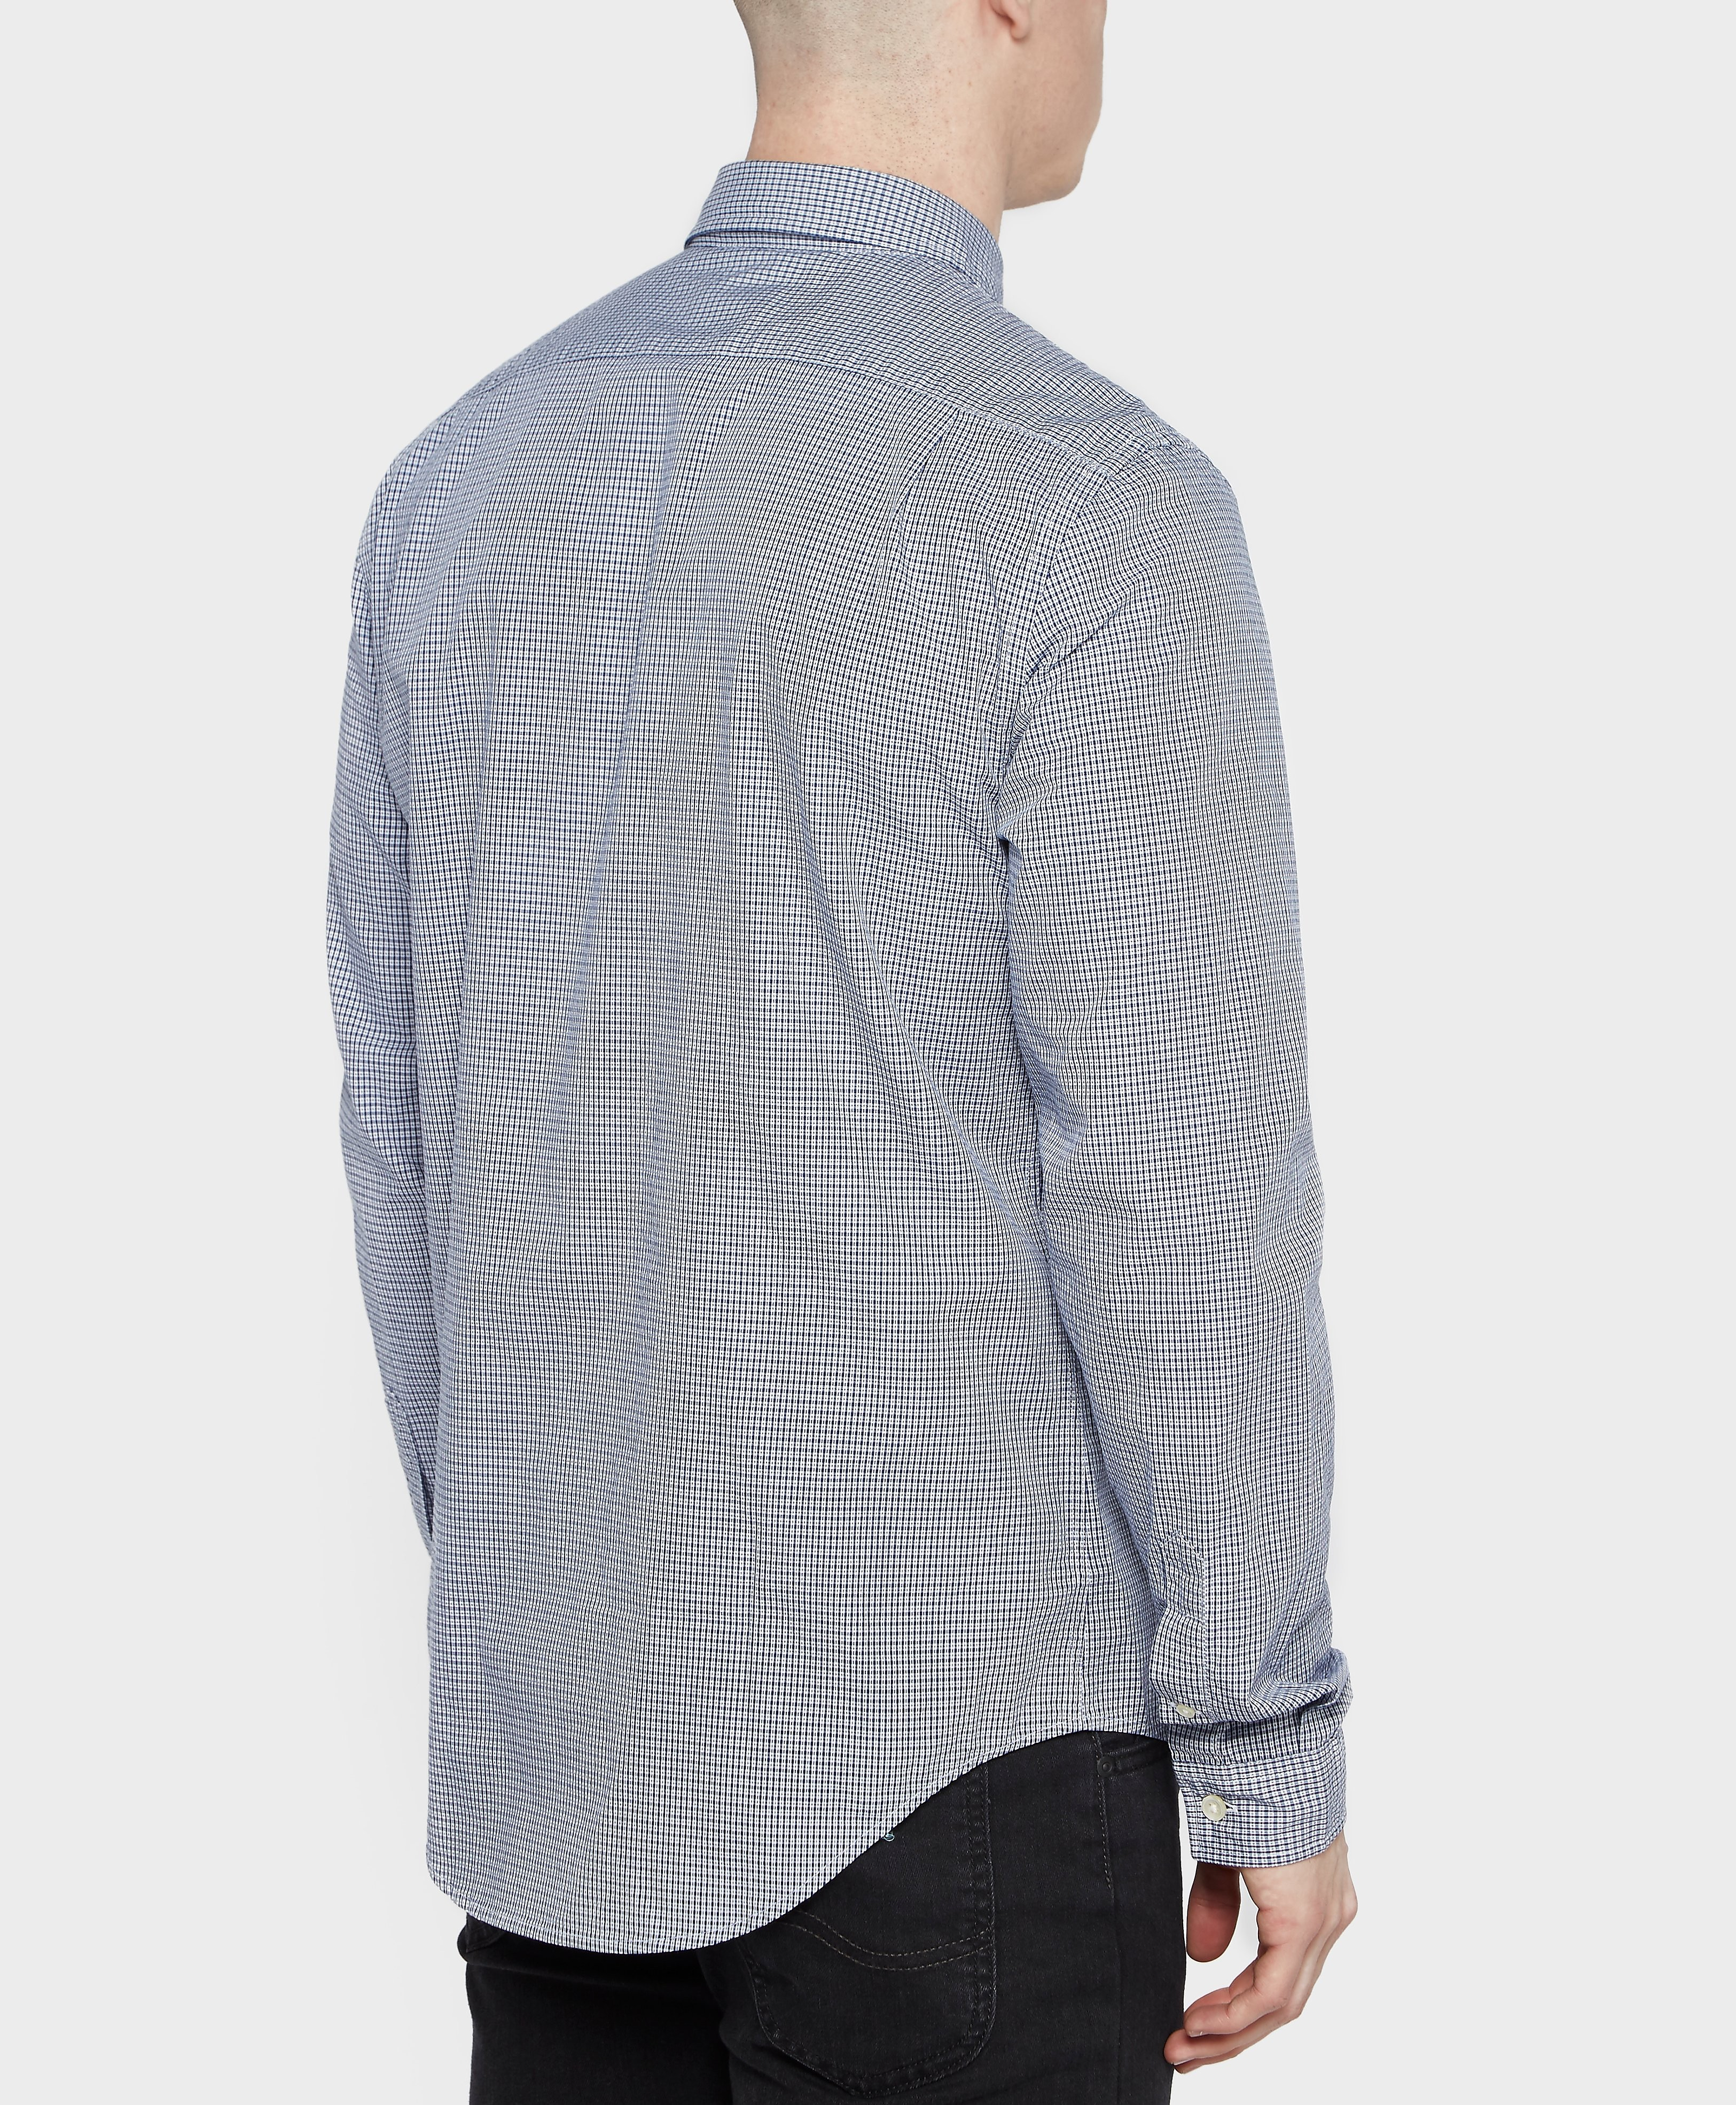 Lacoste Poplin Check Shirt